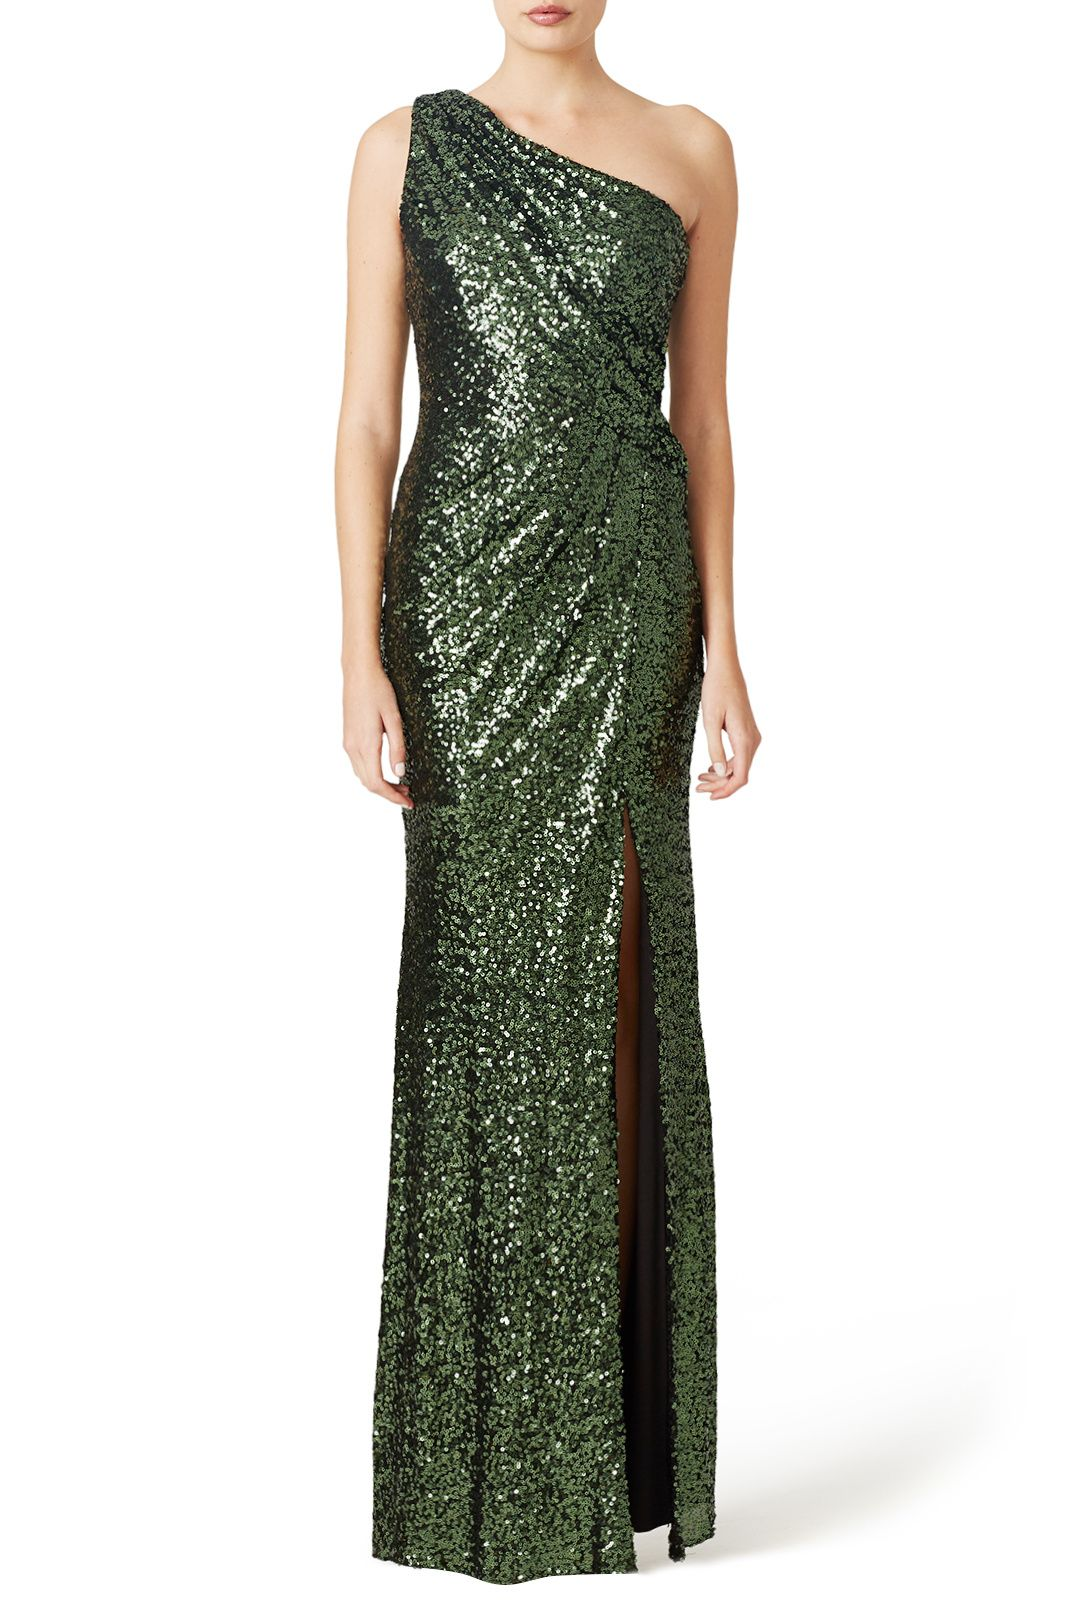 Green Constellation Gown | The Maids ❤ | Pinterest | Badgley ...